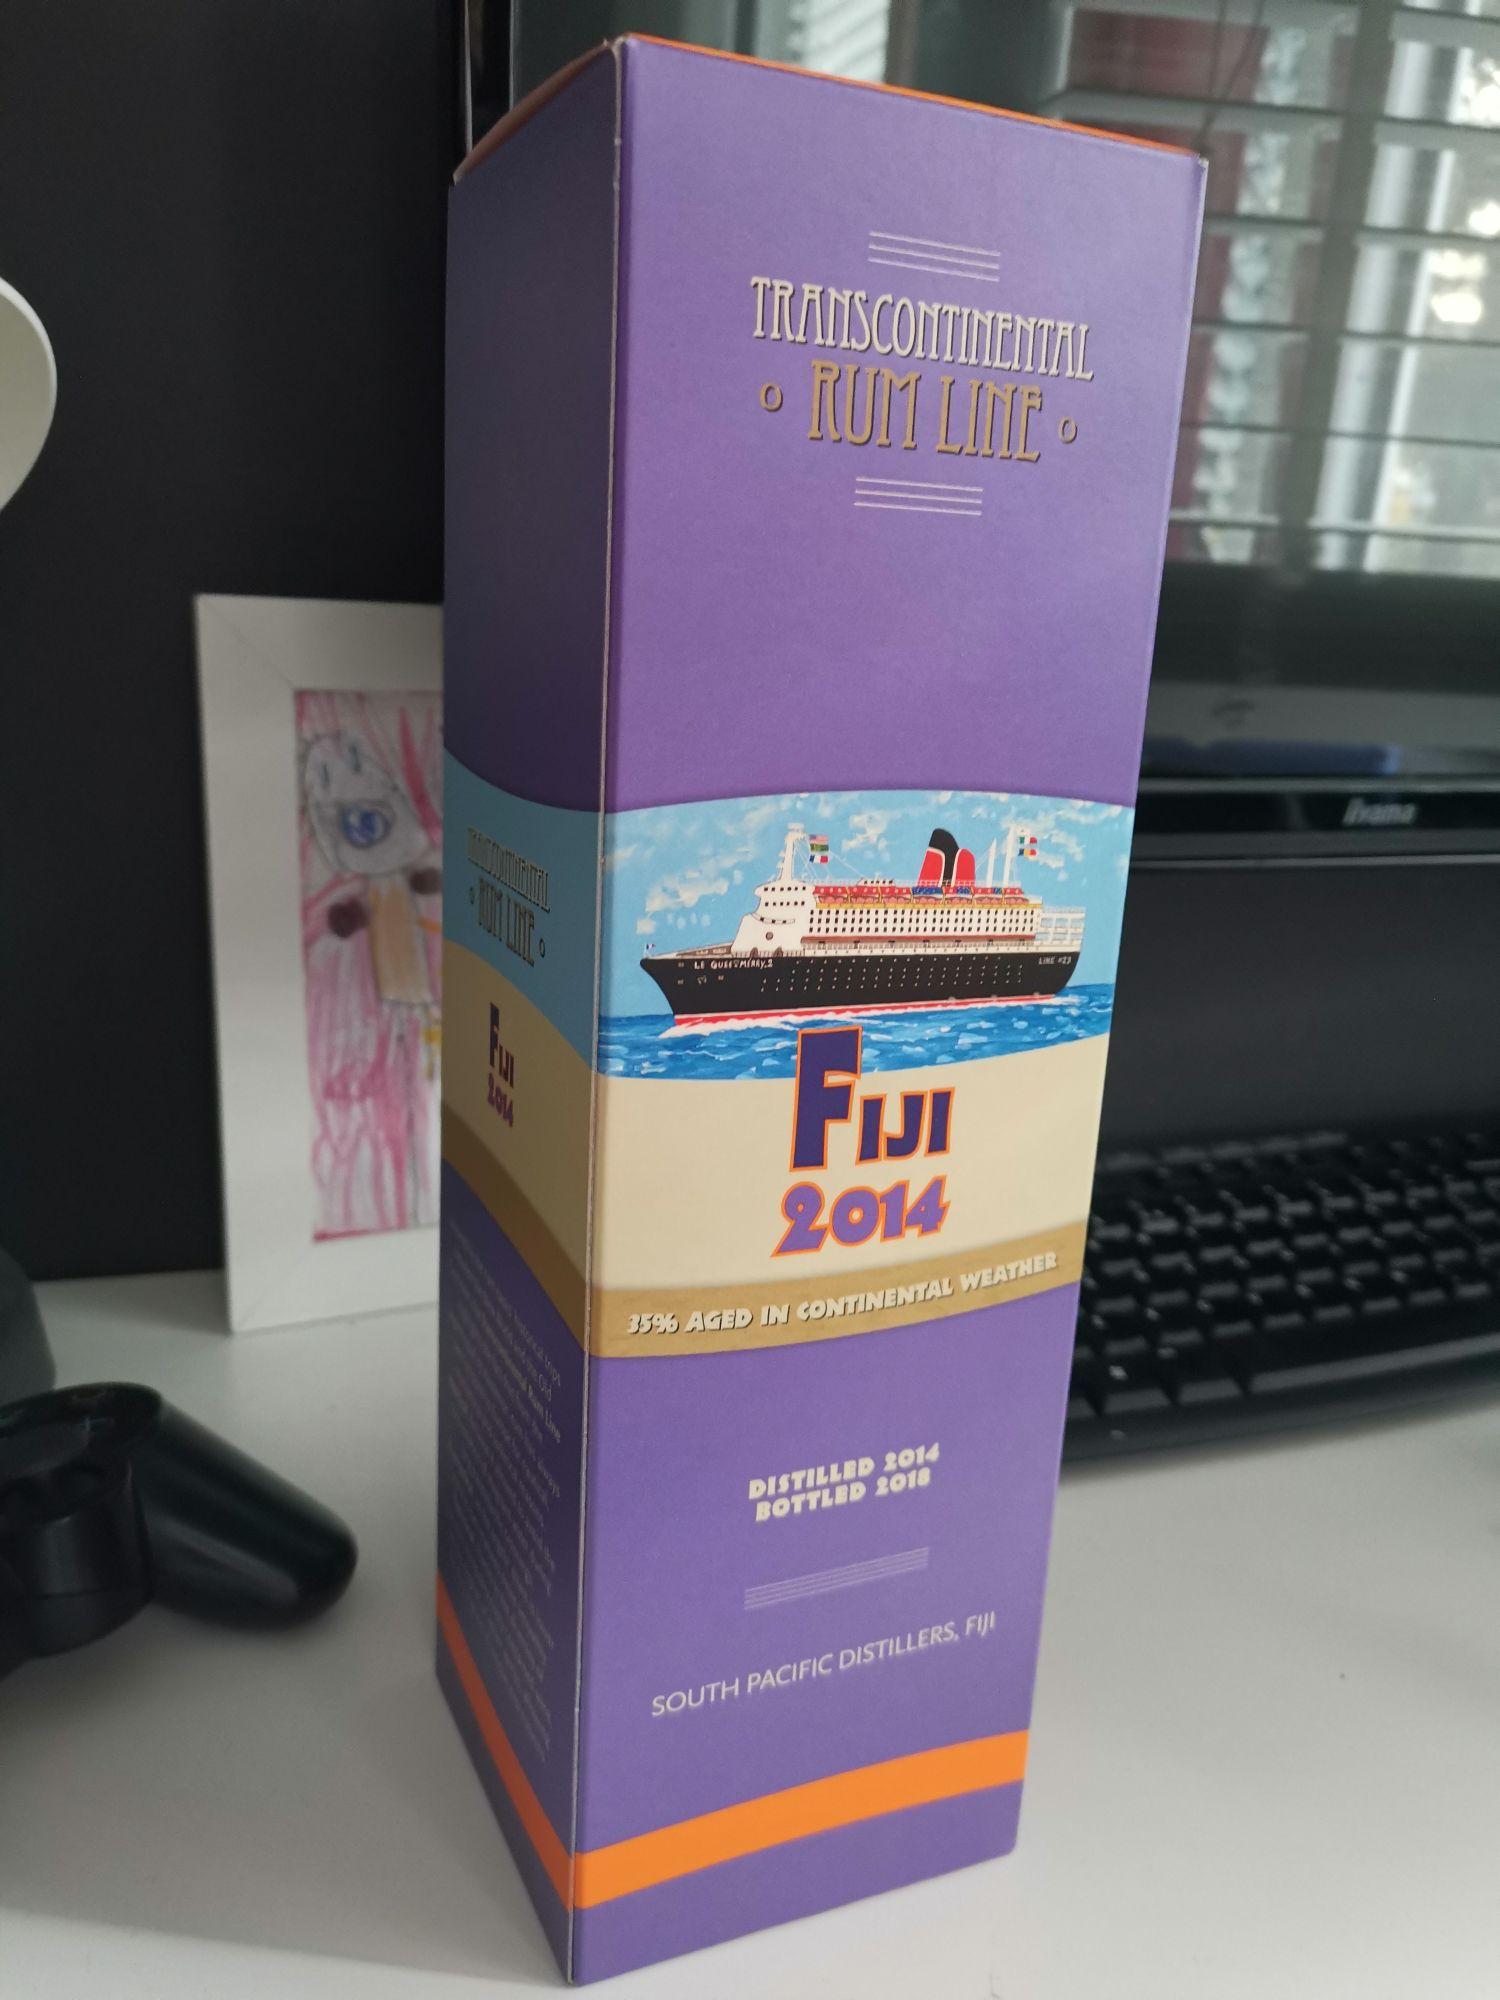 Rum Transcontinental Rum Line Fiji 2014 0,7 AUCHAN